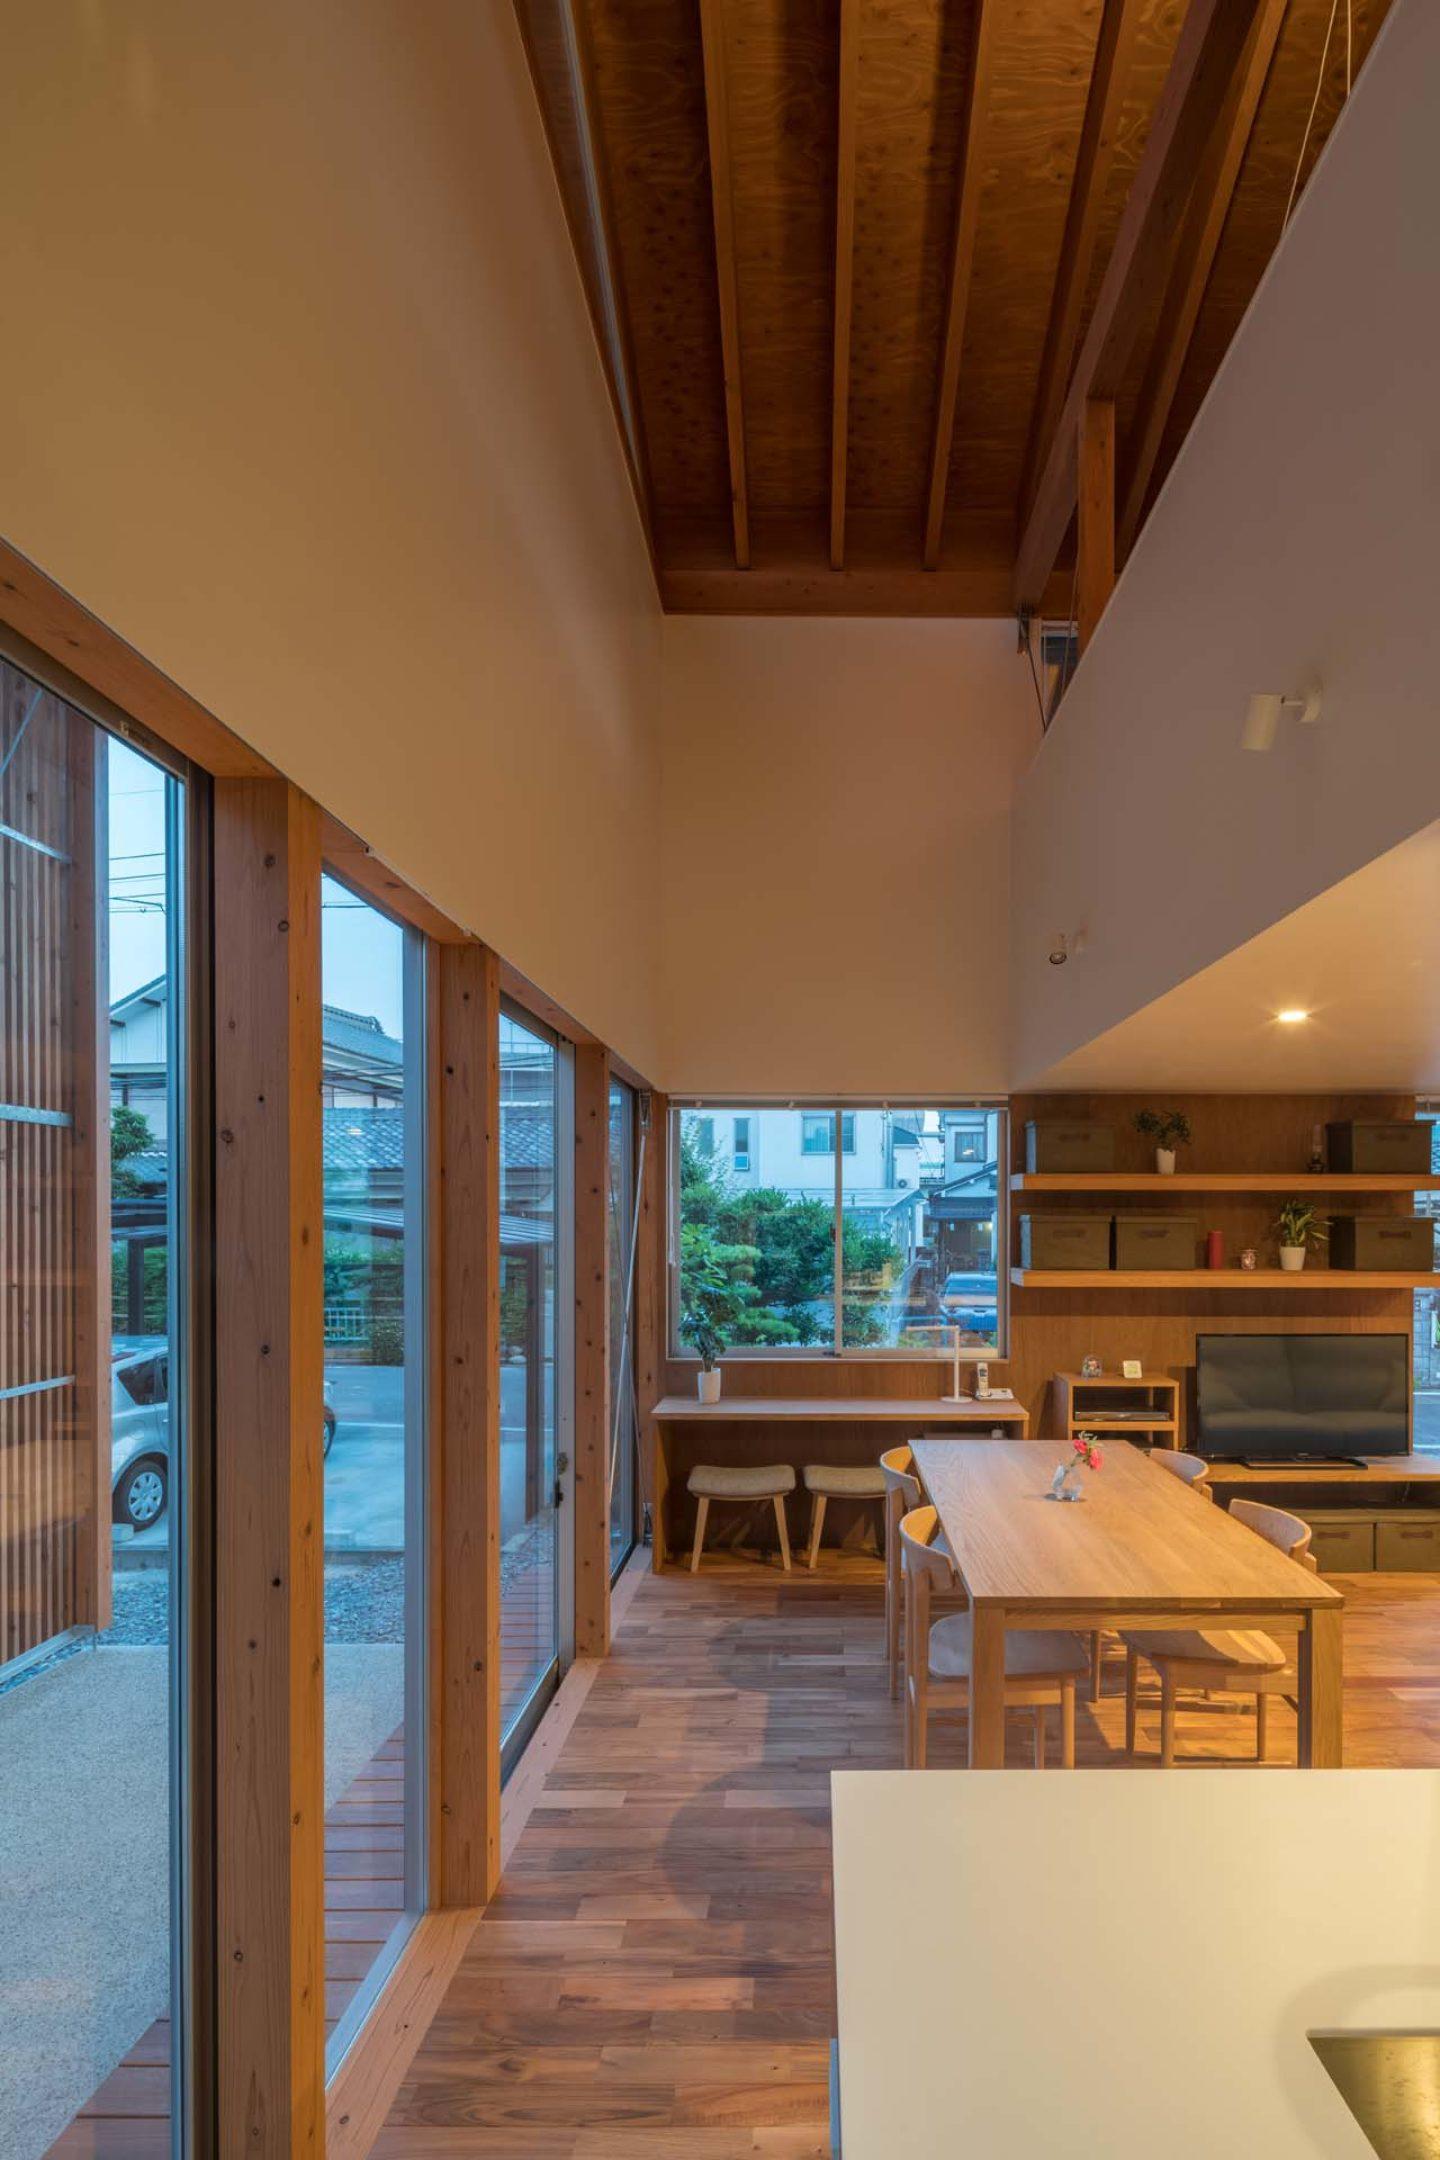 IGNANT-Architecture-Kota-Mizuishi-House-In-Otai-0012